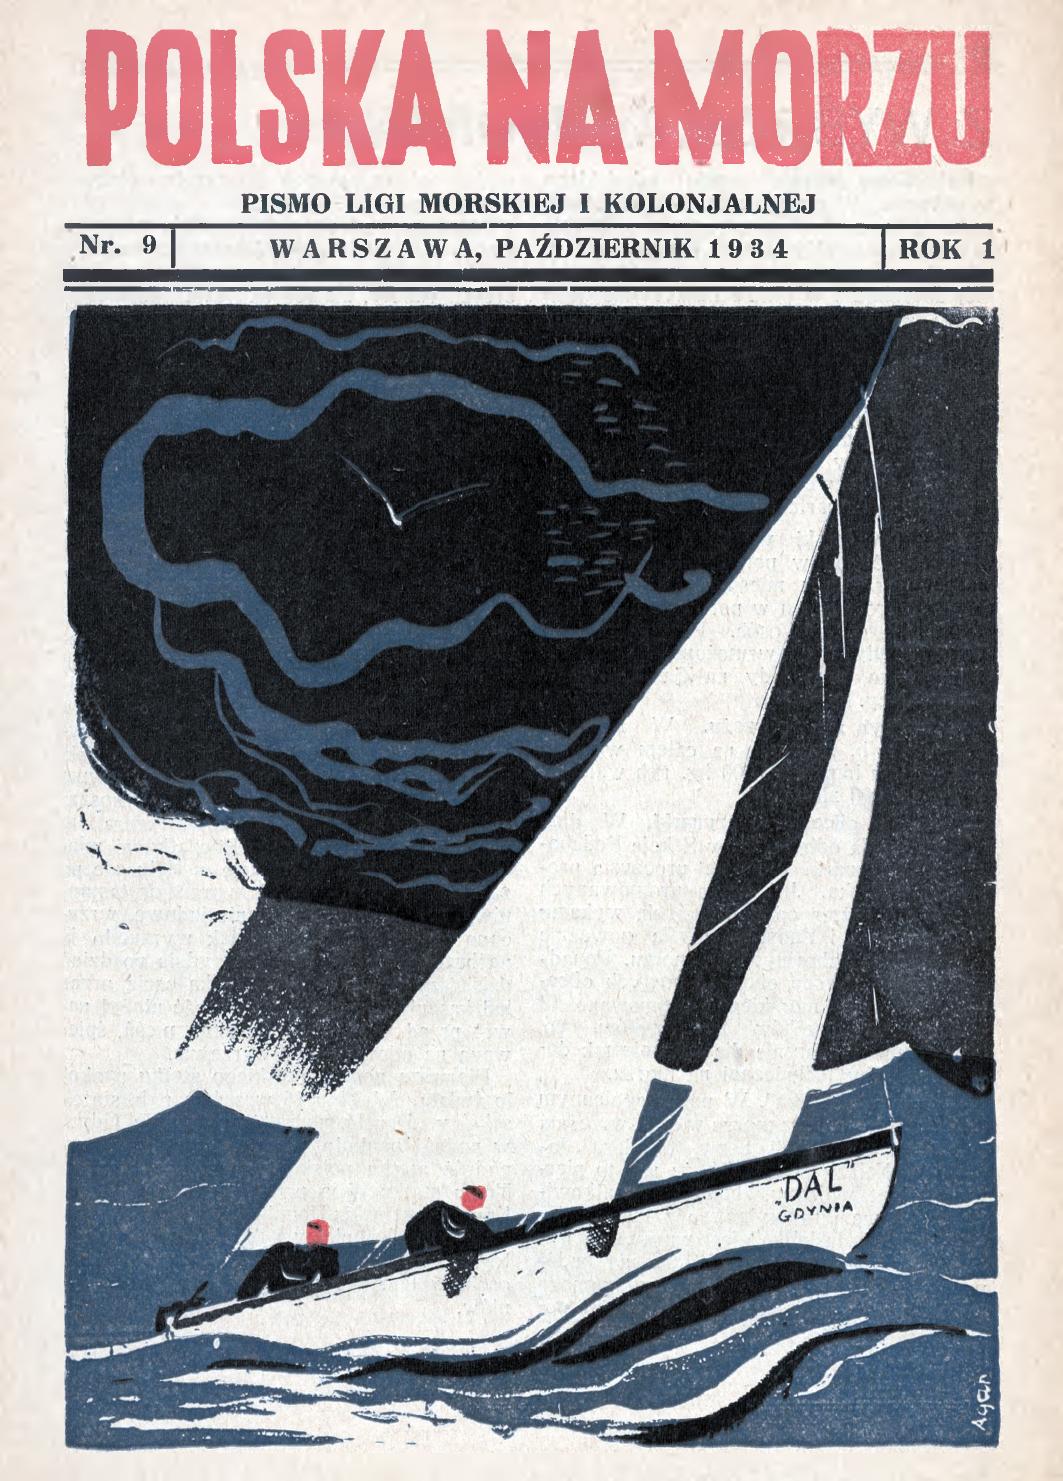 Polska na Morzu : pismo Ligi Morskiej i Kolonjalnej. - Liga Morska i Kolonialna, 1934, nr 9